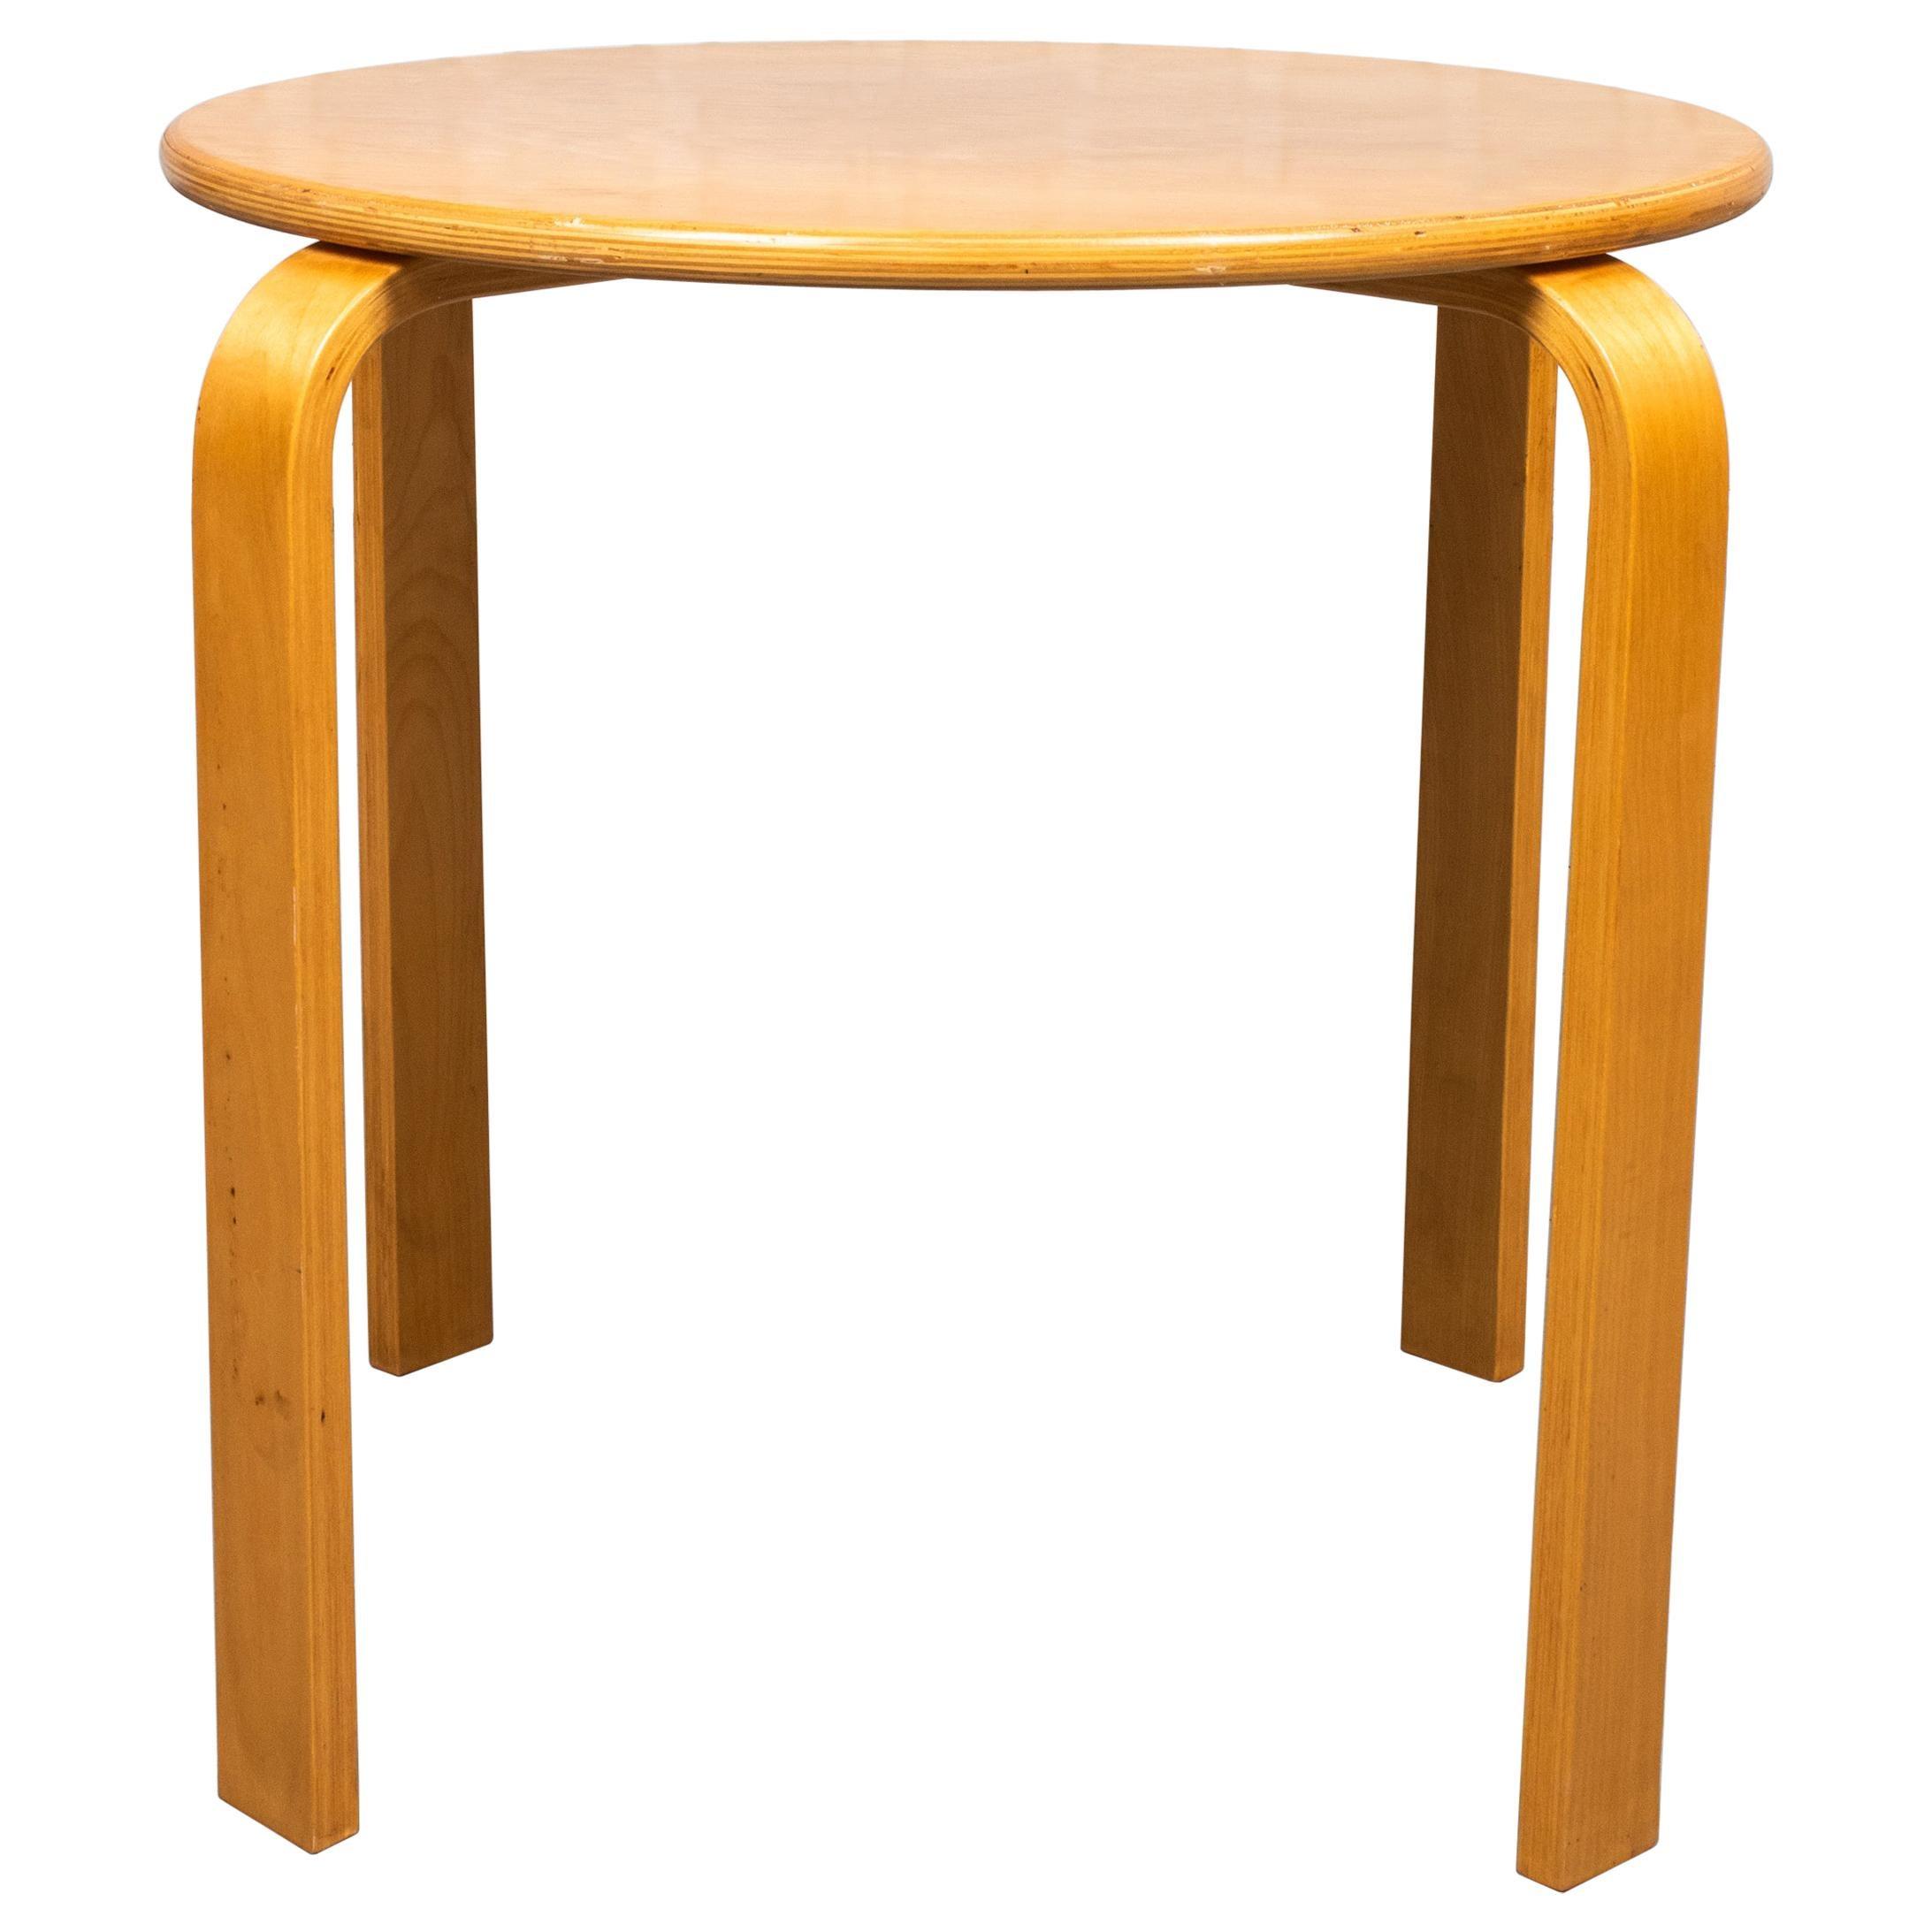 Alvar Aalto Style Mid-Century Modern Side Table